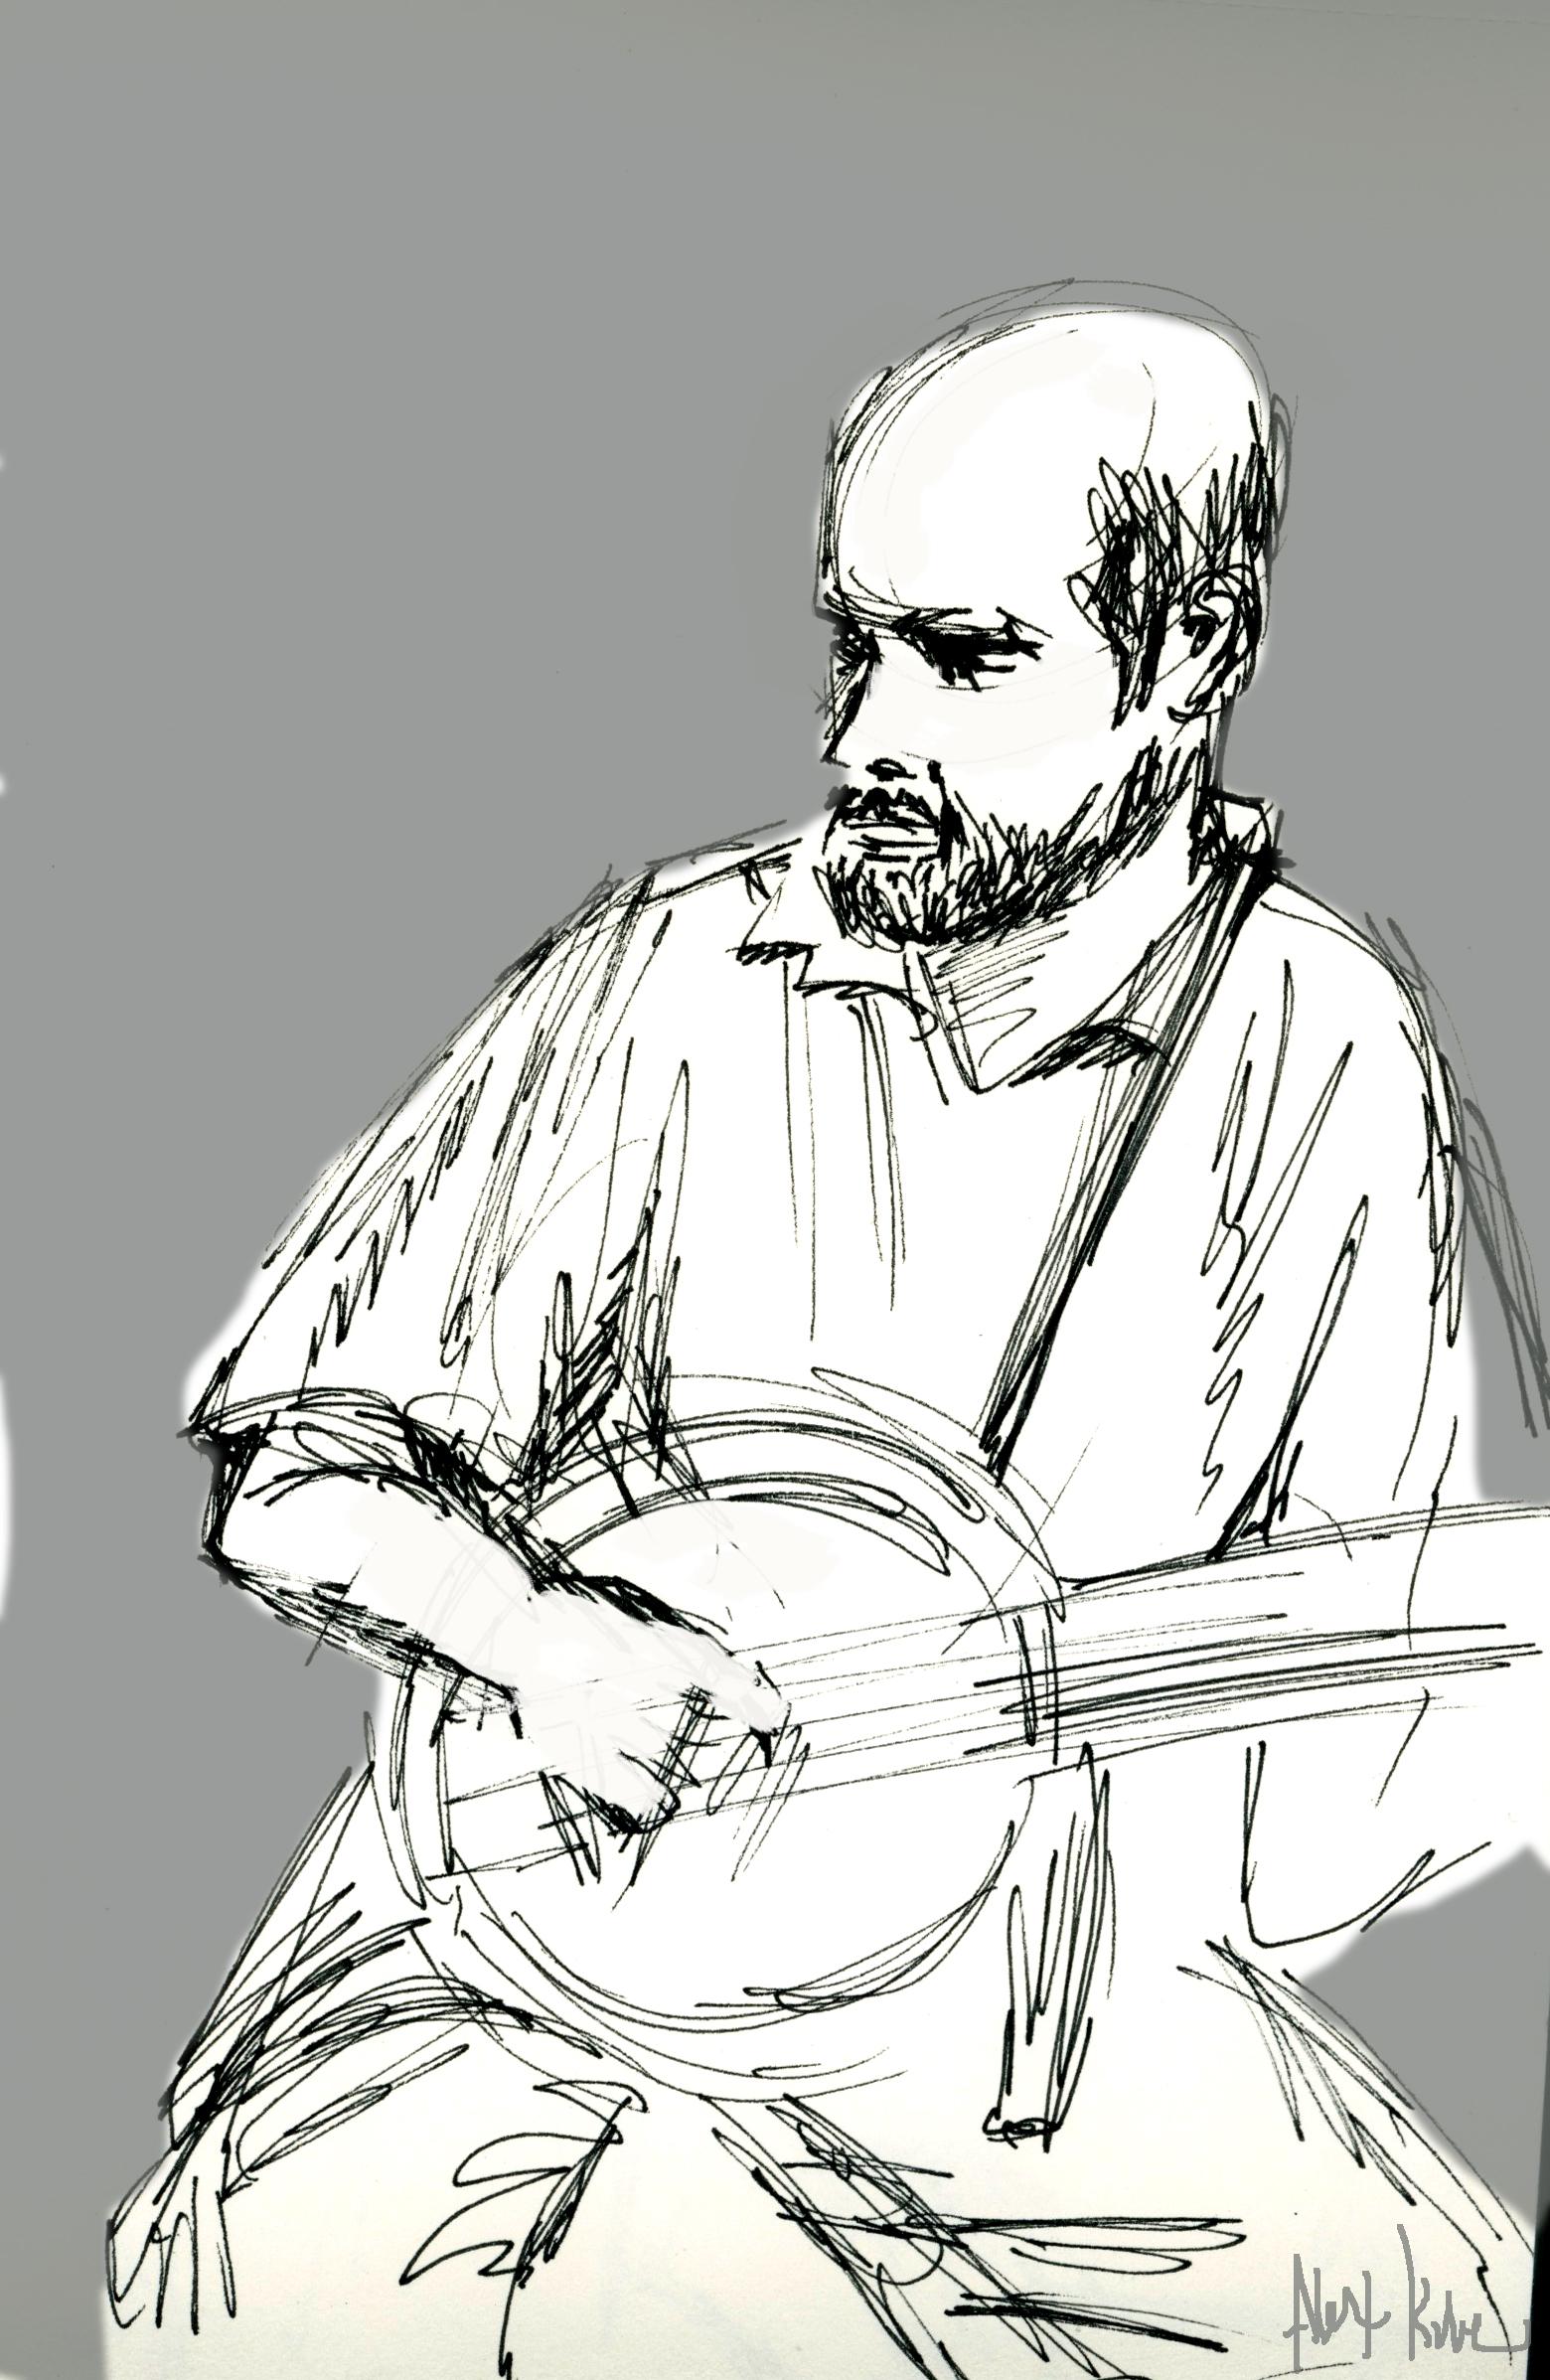 Shane Burrows